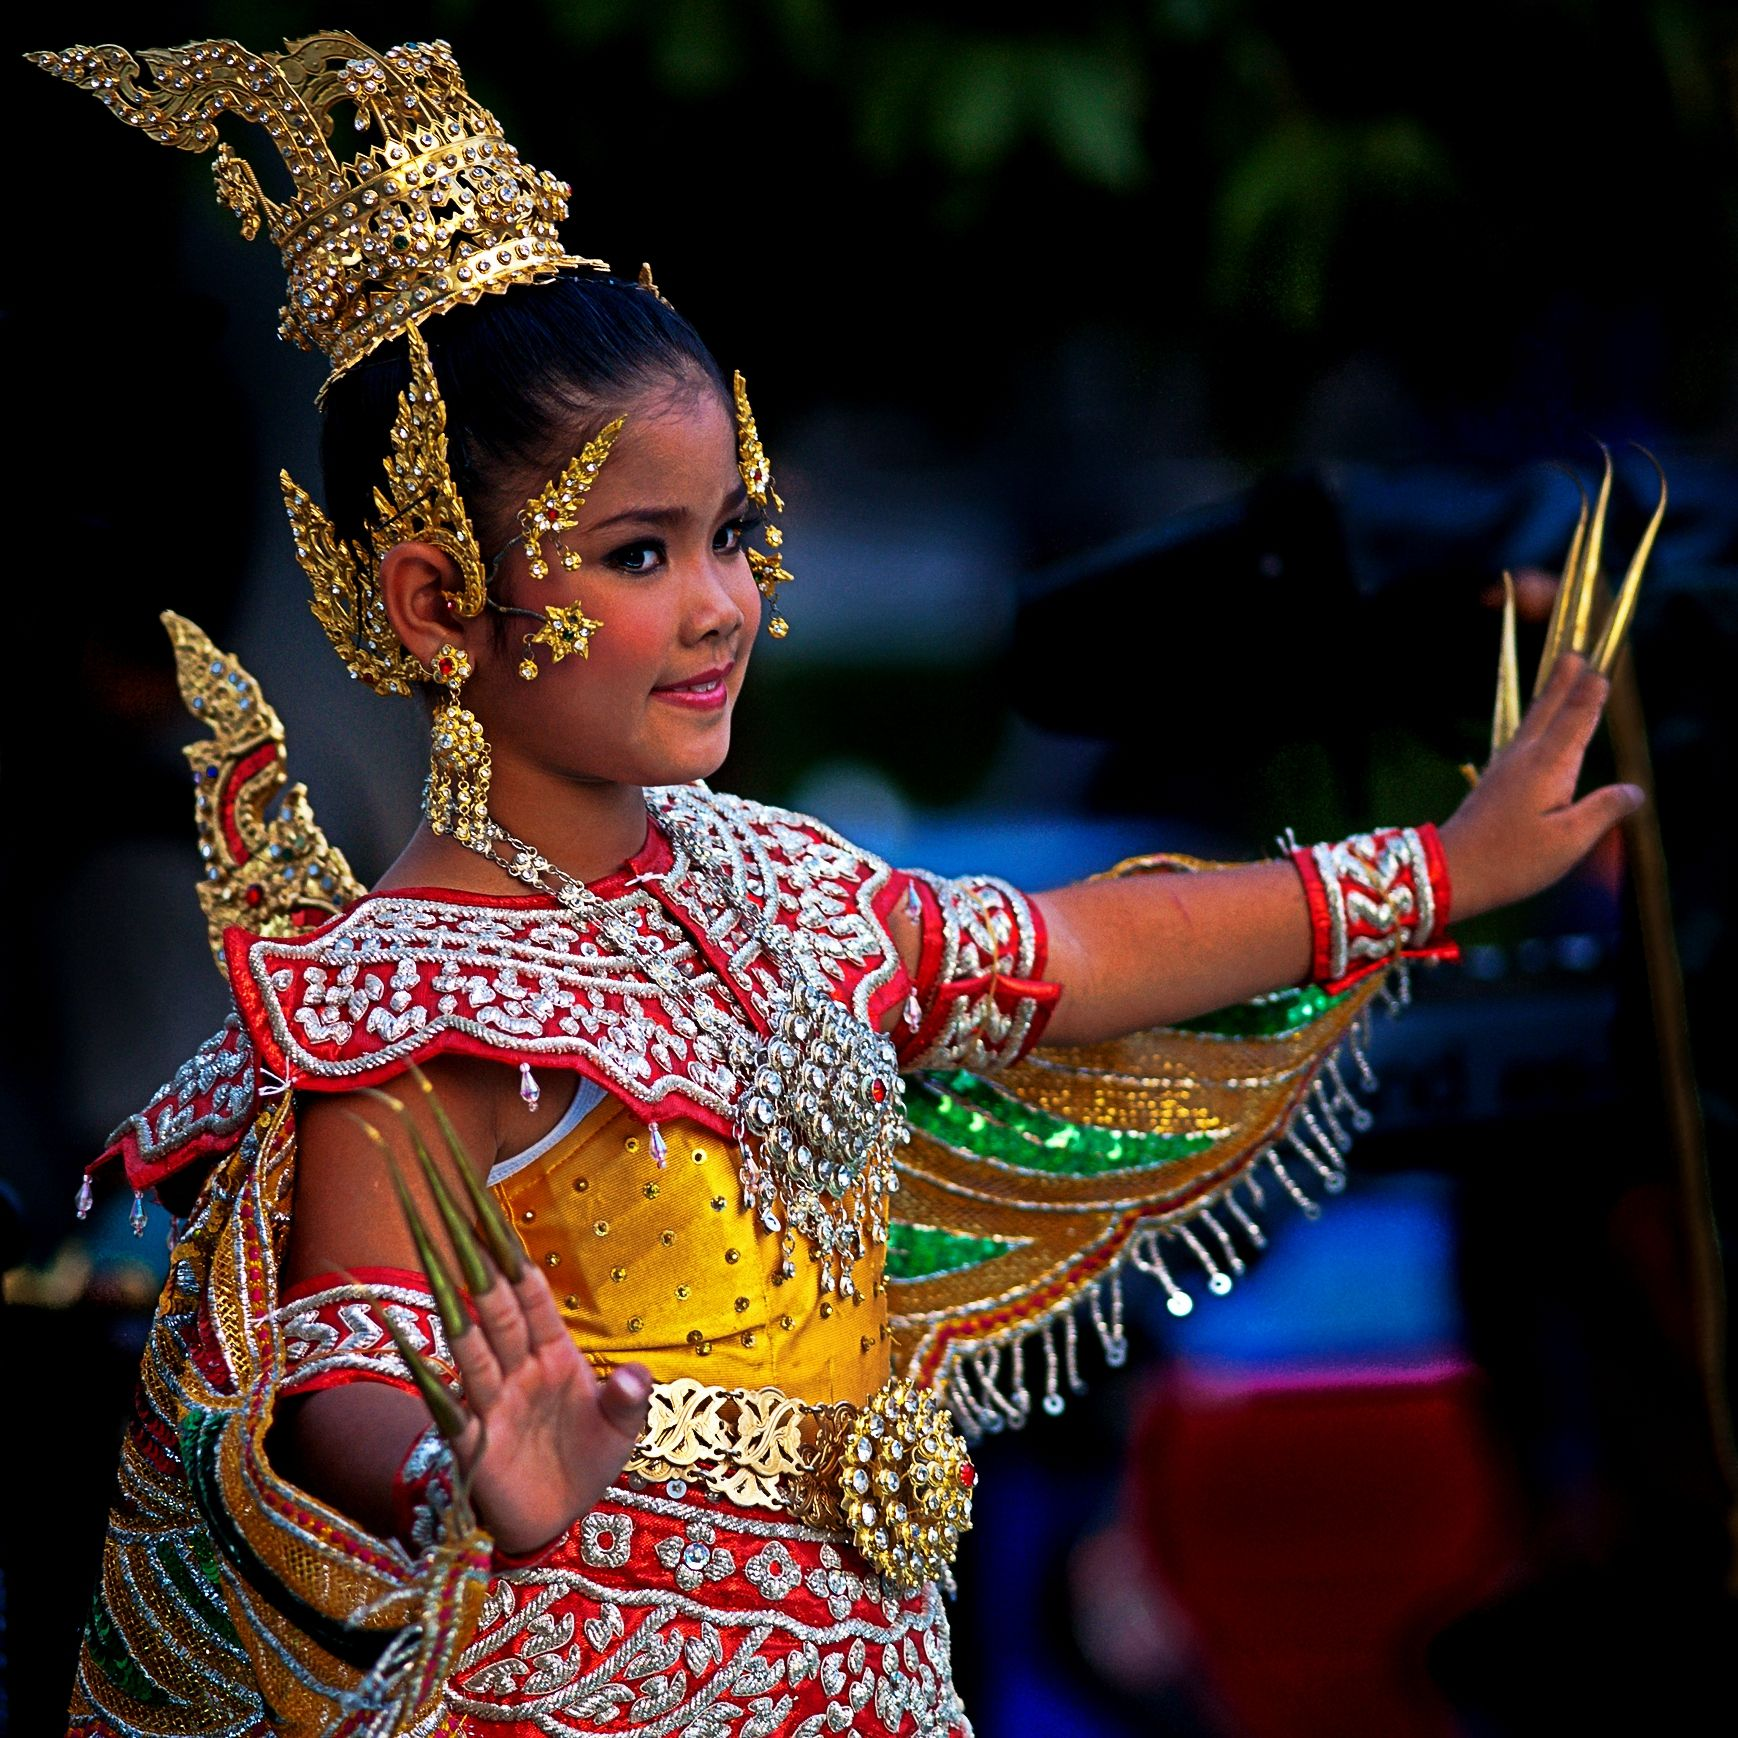 Teen beautiful thai dancer